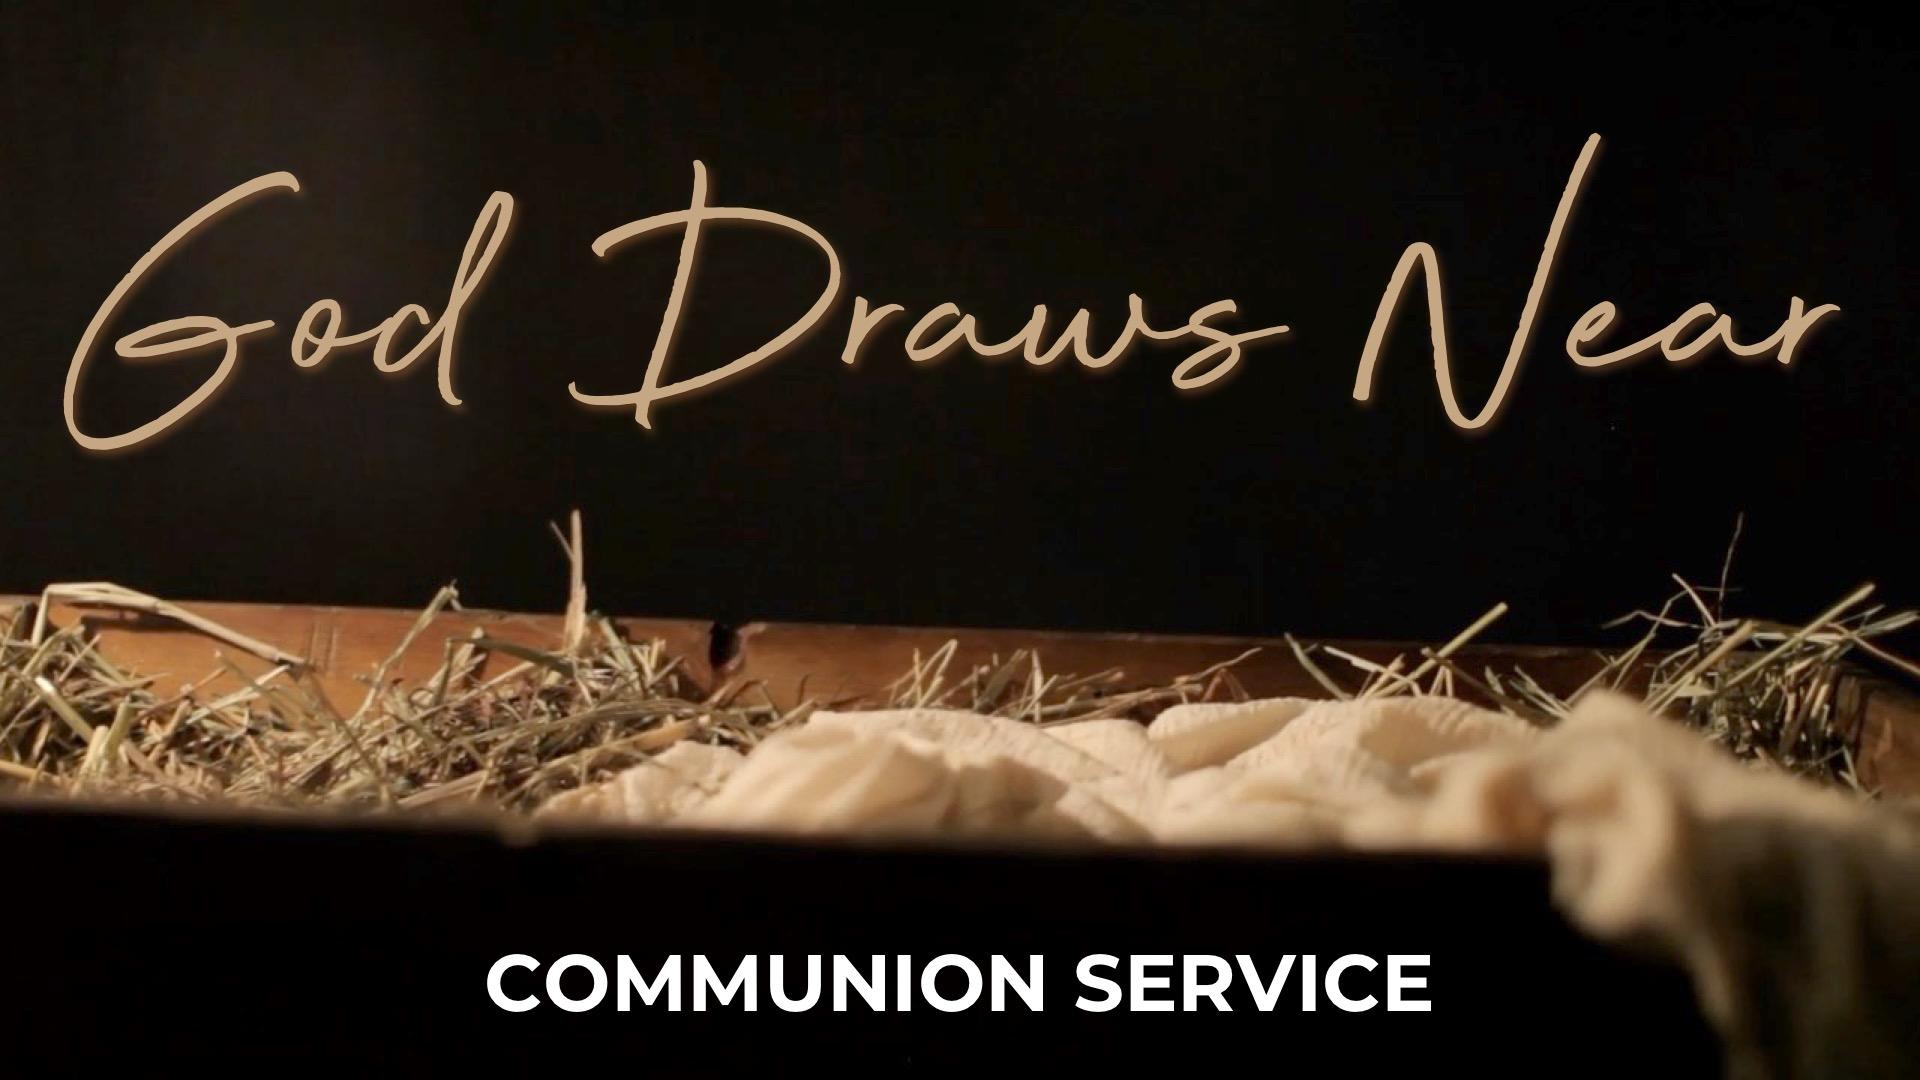 God Draws Near